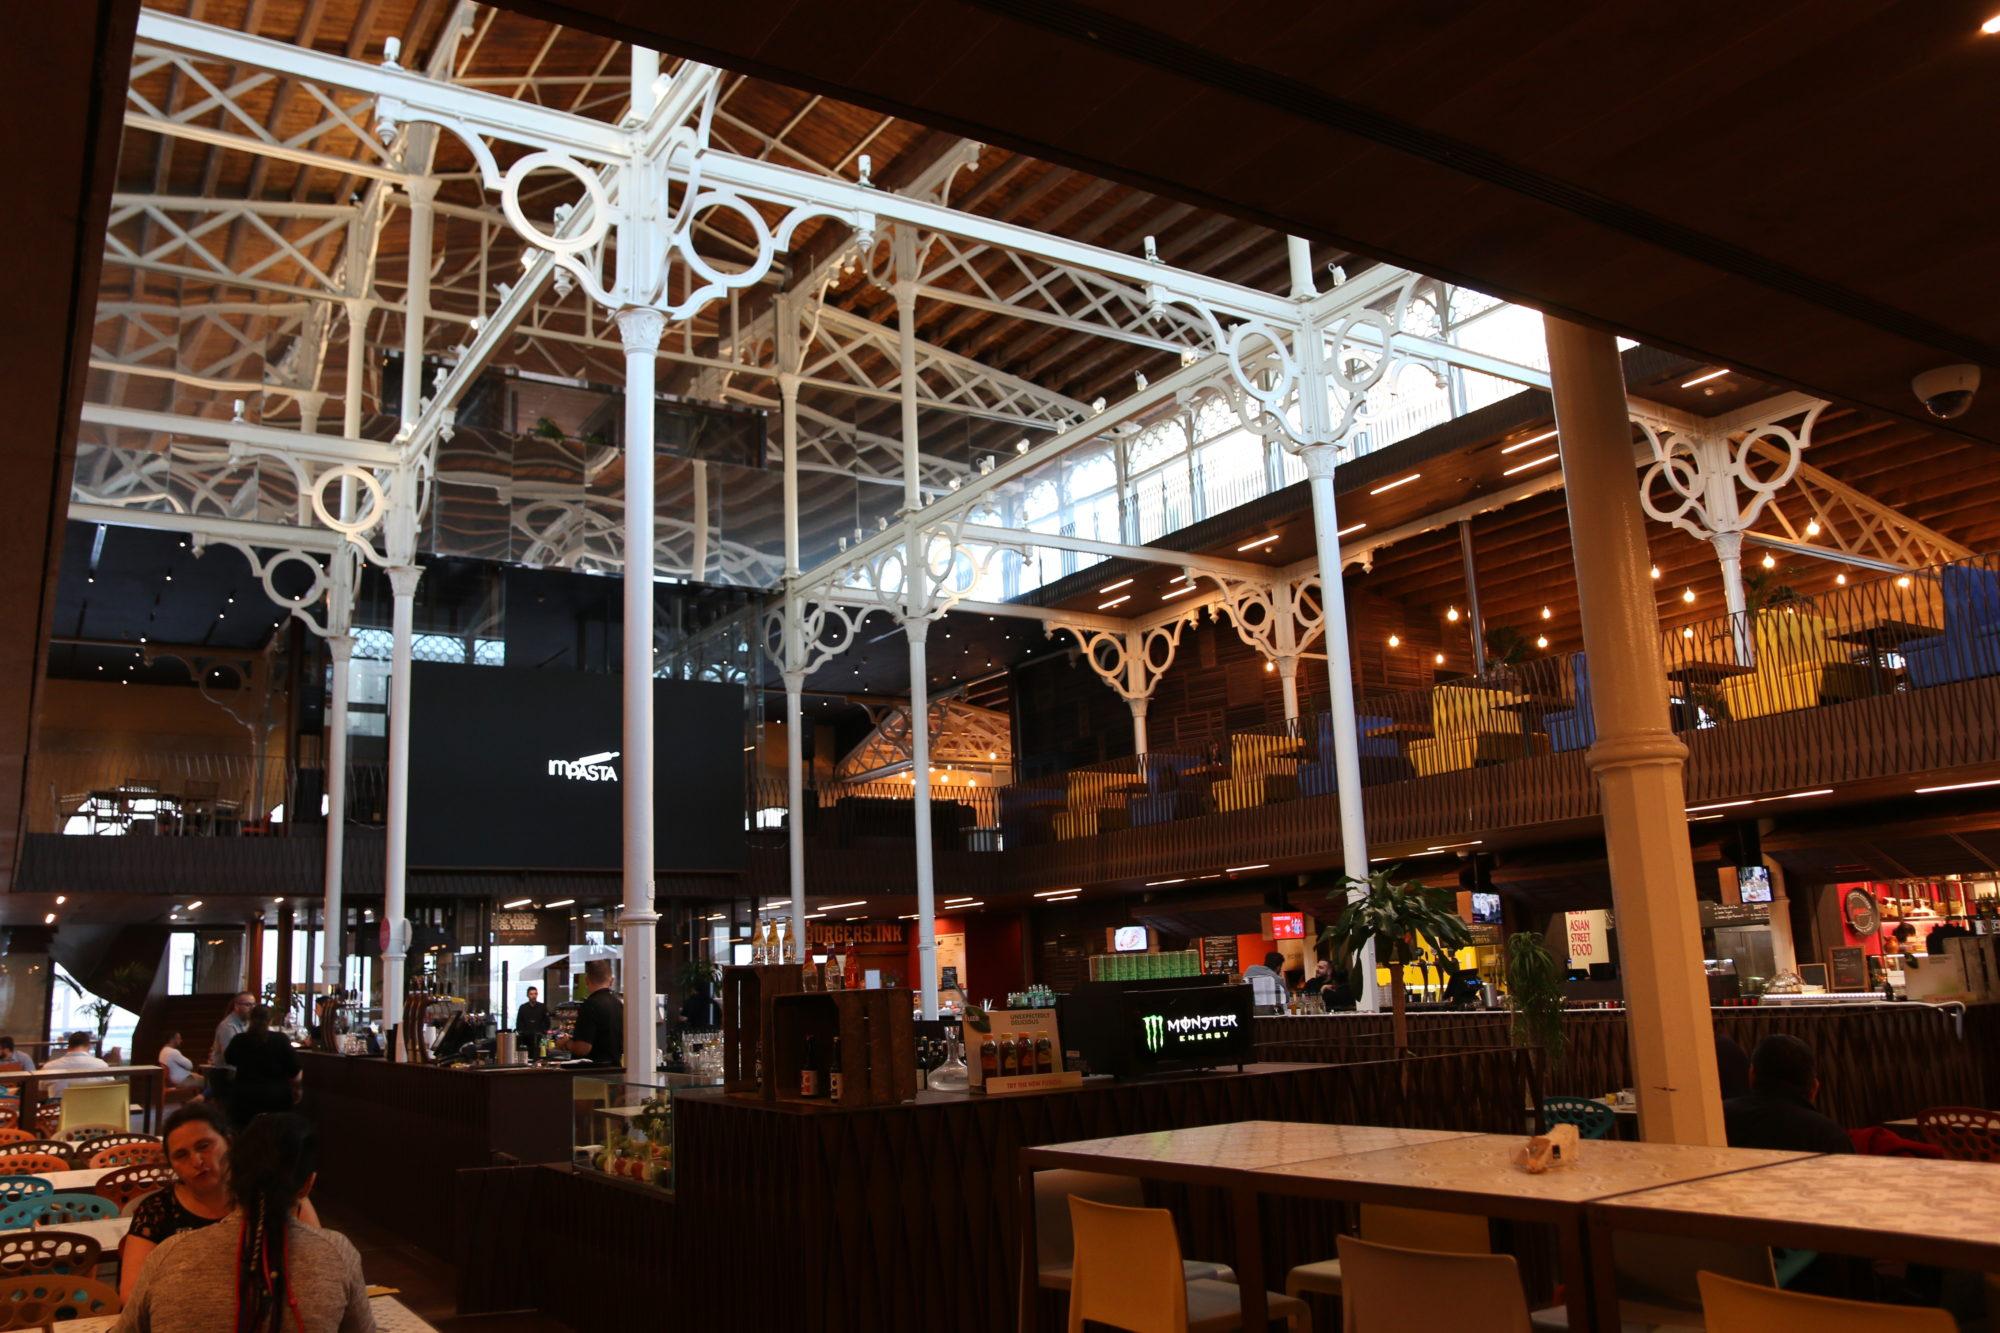 Is-suq tal-beltでお買い物と晩ごはんを食べる~マルタ/バレッタの新商業施設!~